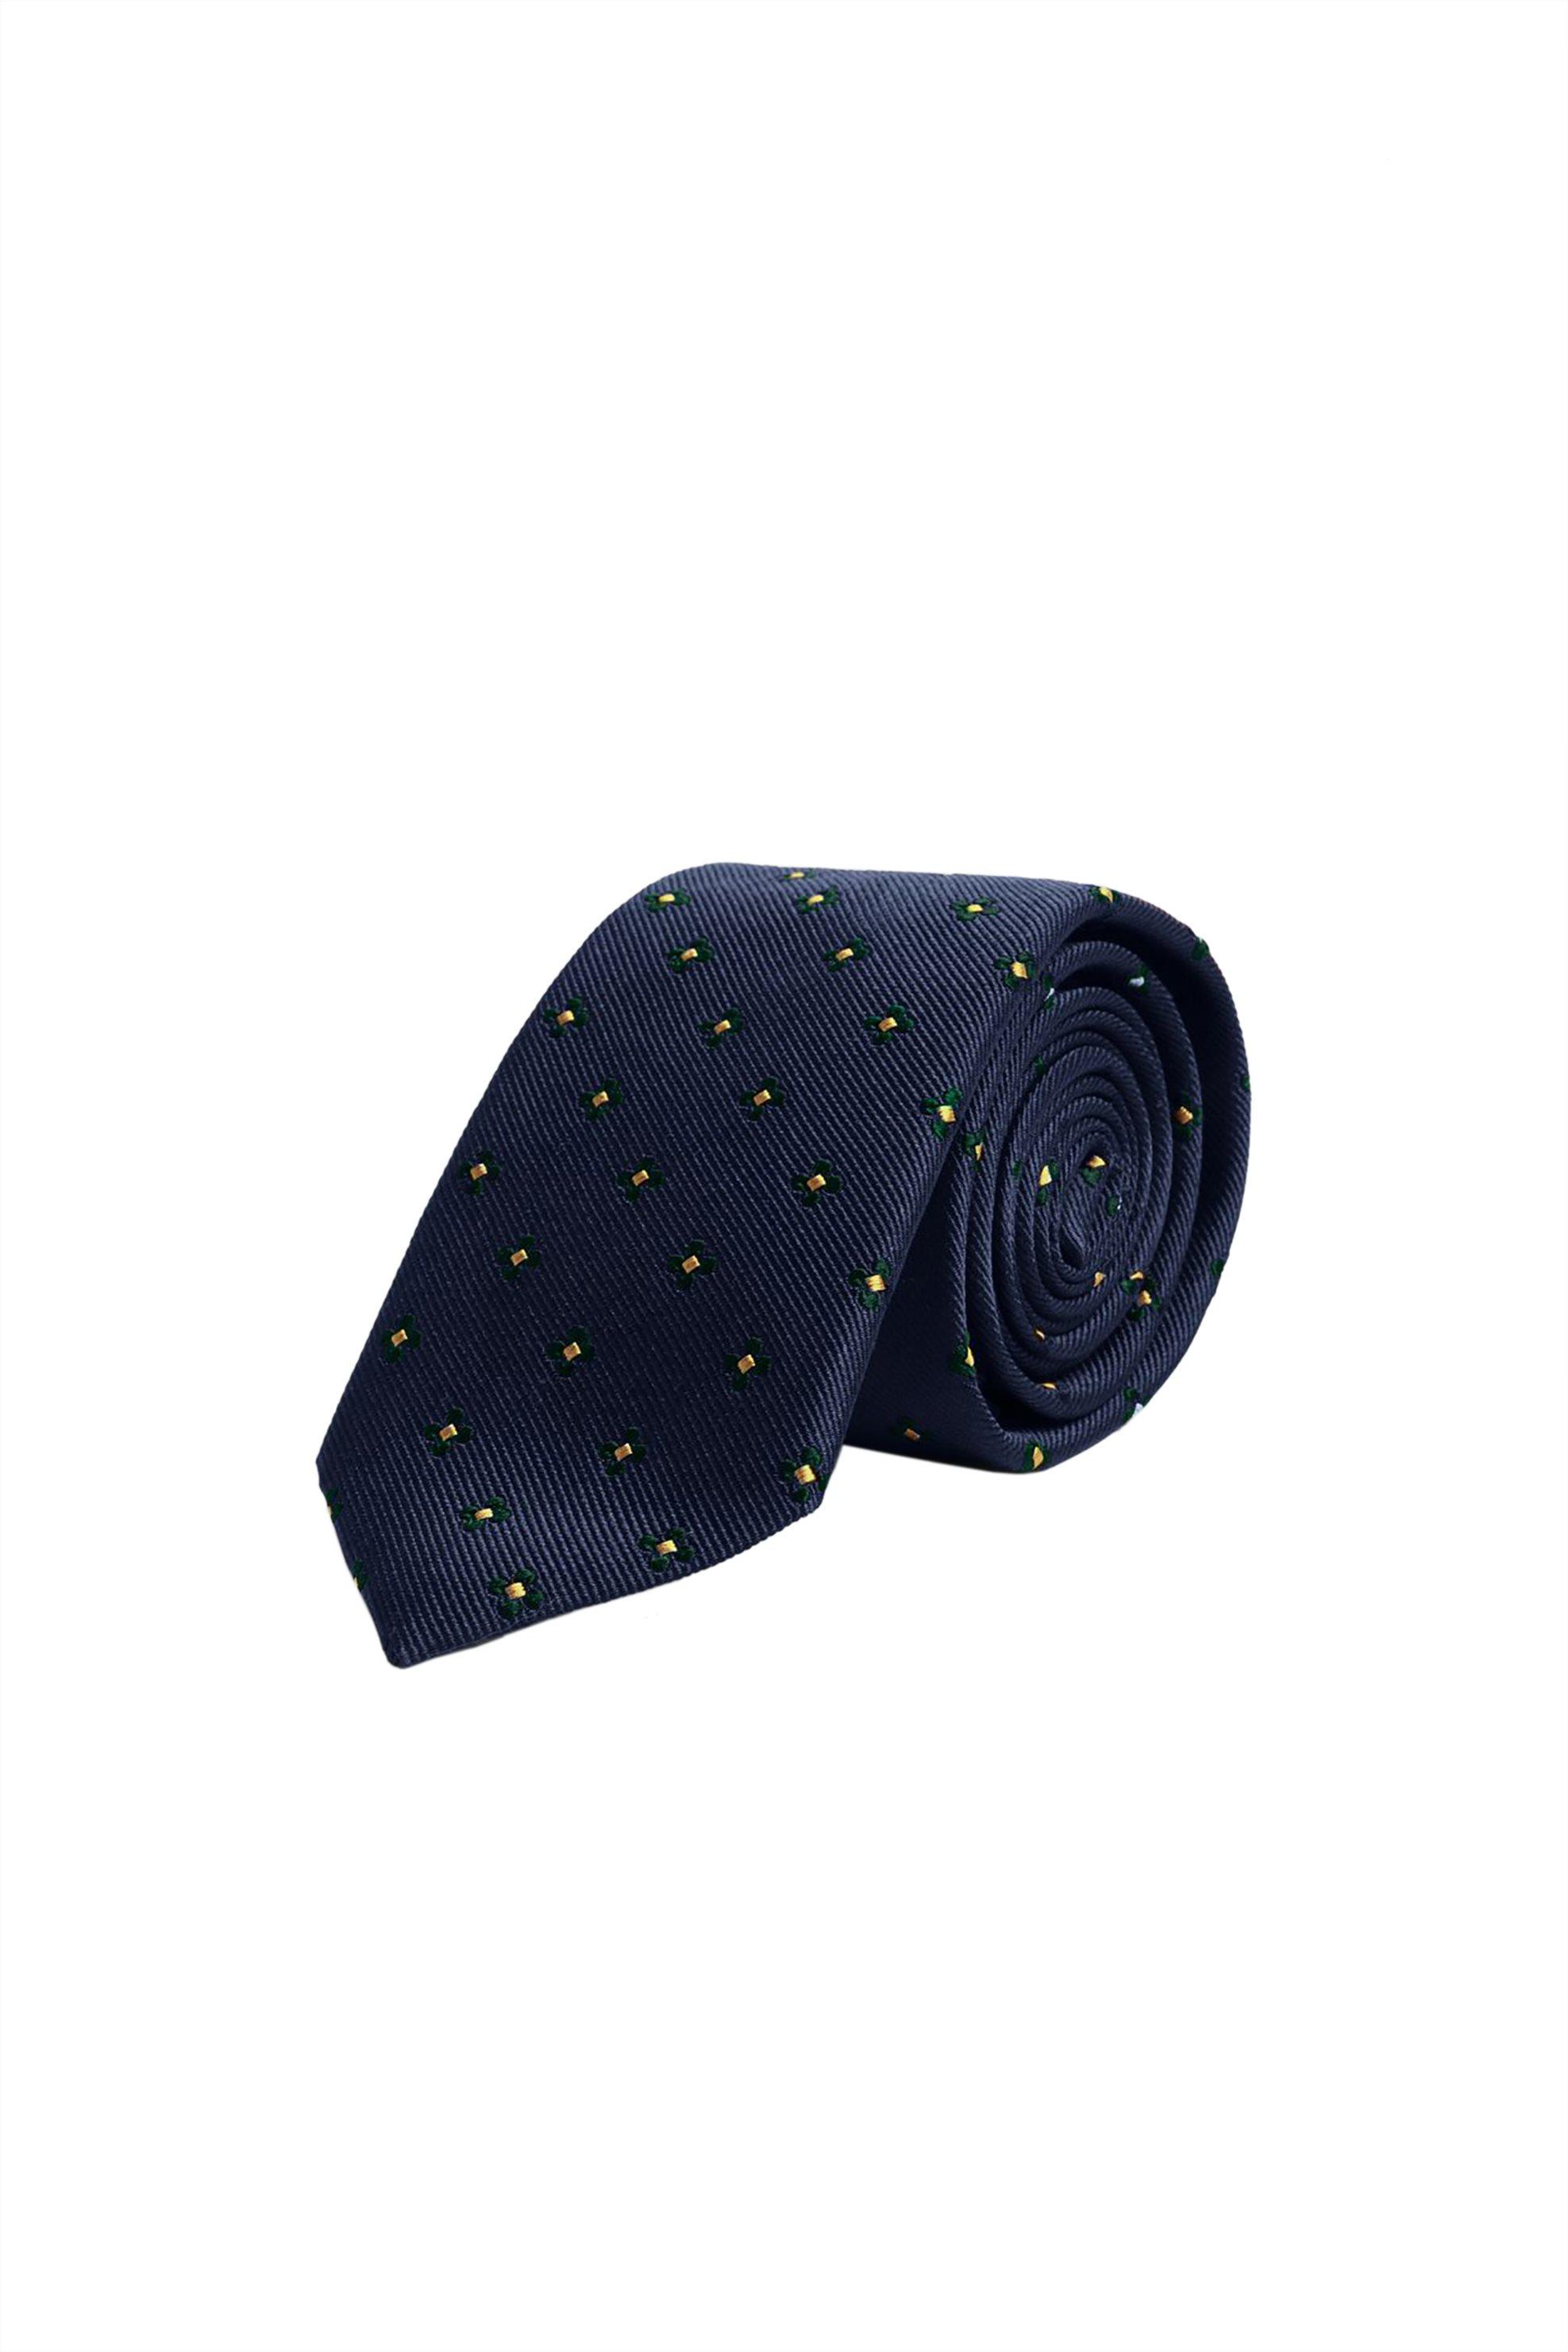 Gant ανδρική μεταξωτή γραβάτα με κεντημένα μικροσχέδια